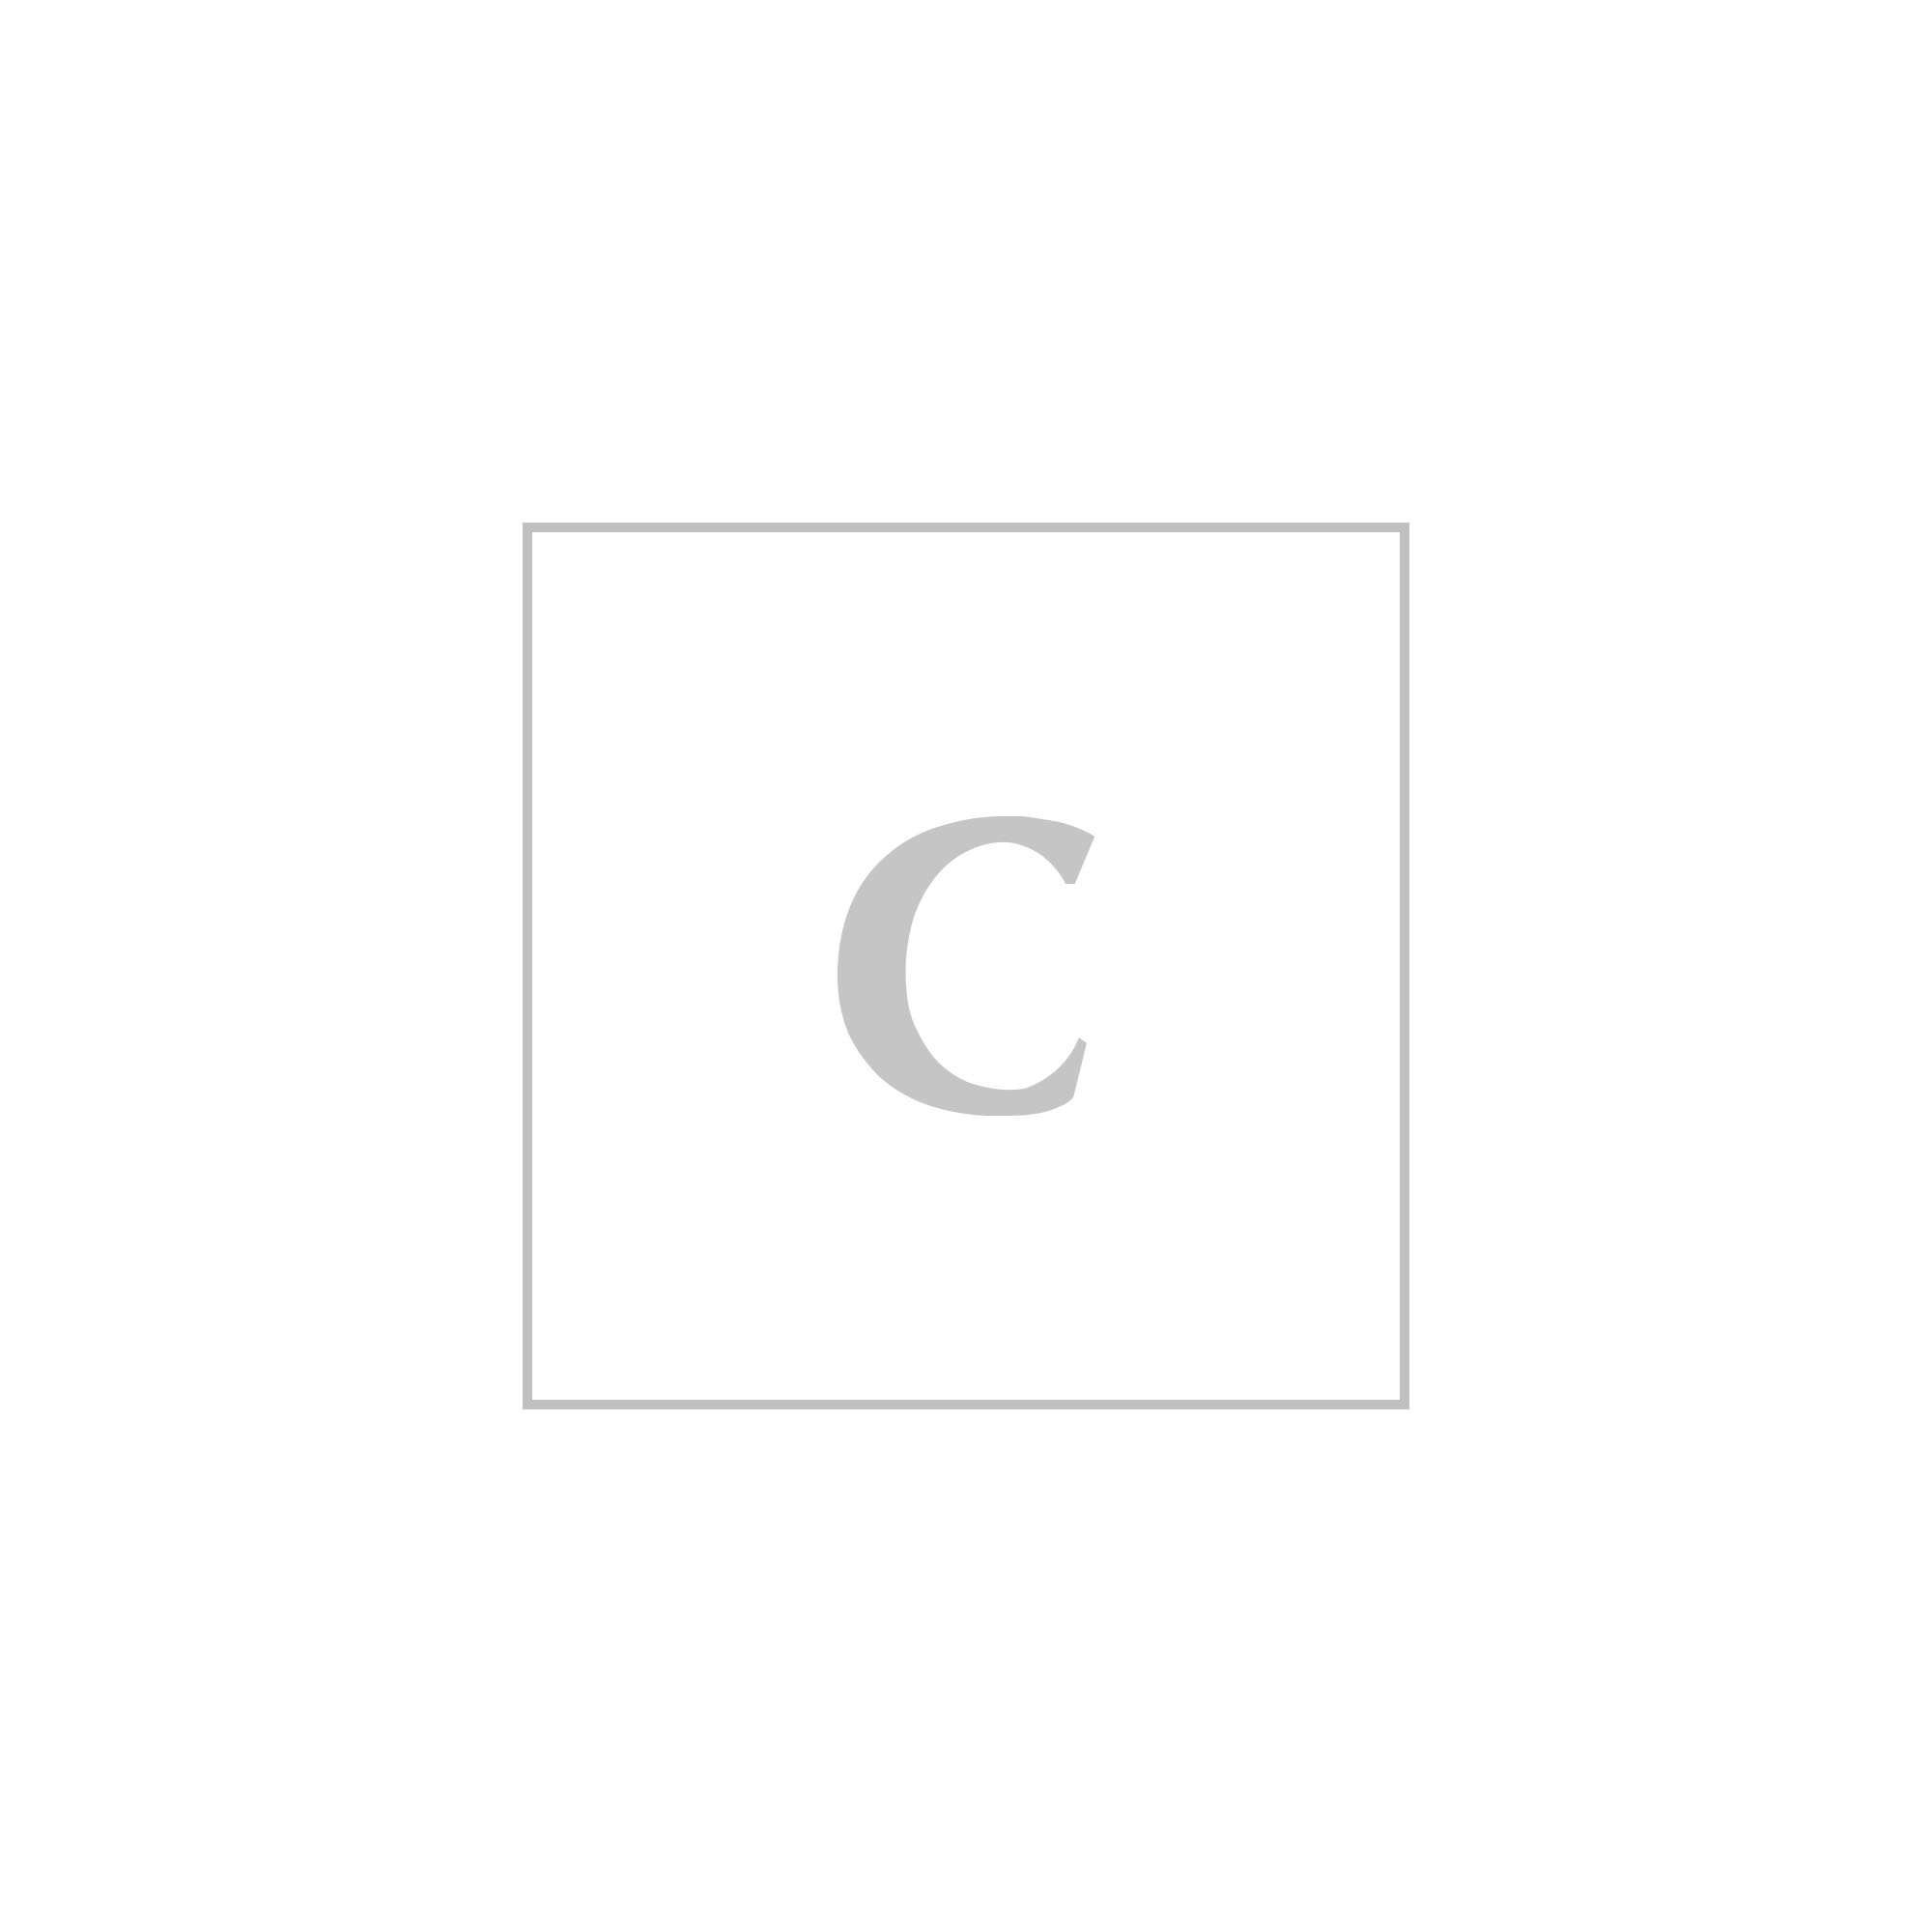 prada accessori donna portacarte logo lettering